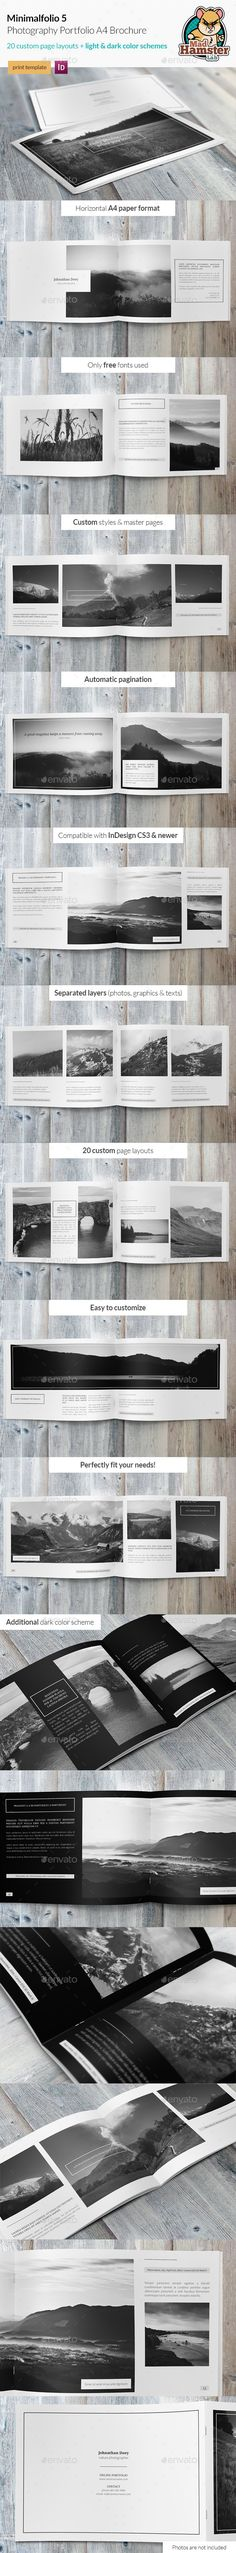 Minimalfolio 5 Photography Portfolio A4 Brochure - Portfolio Brochures